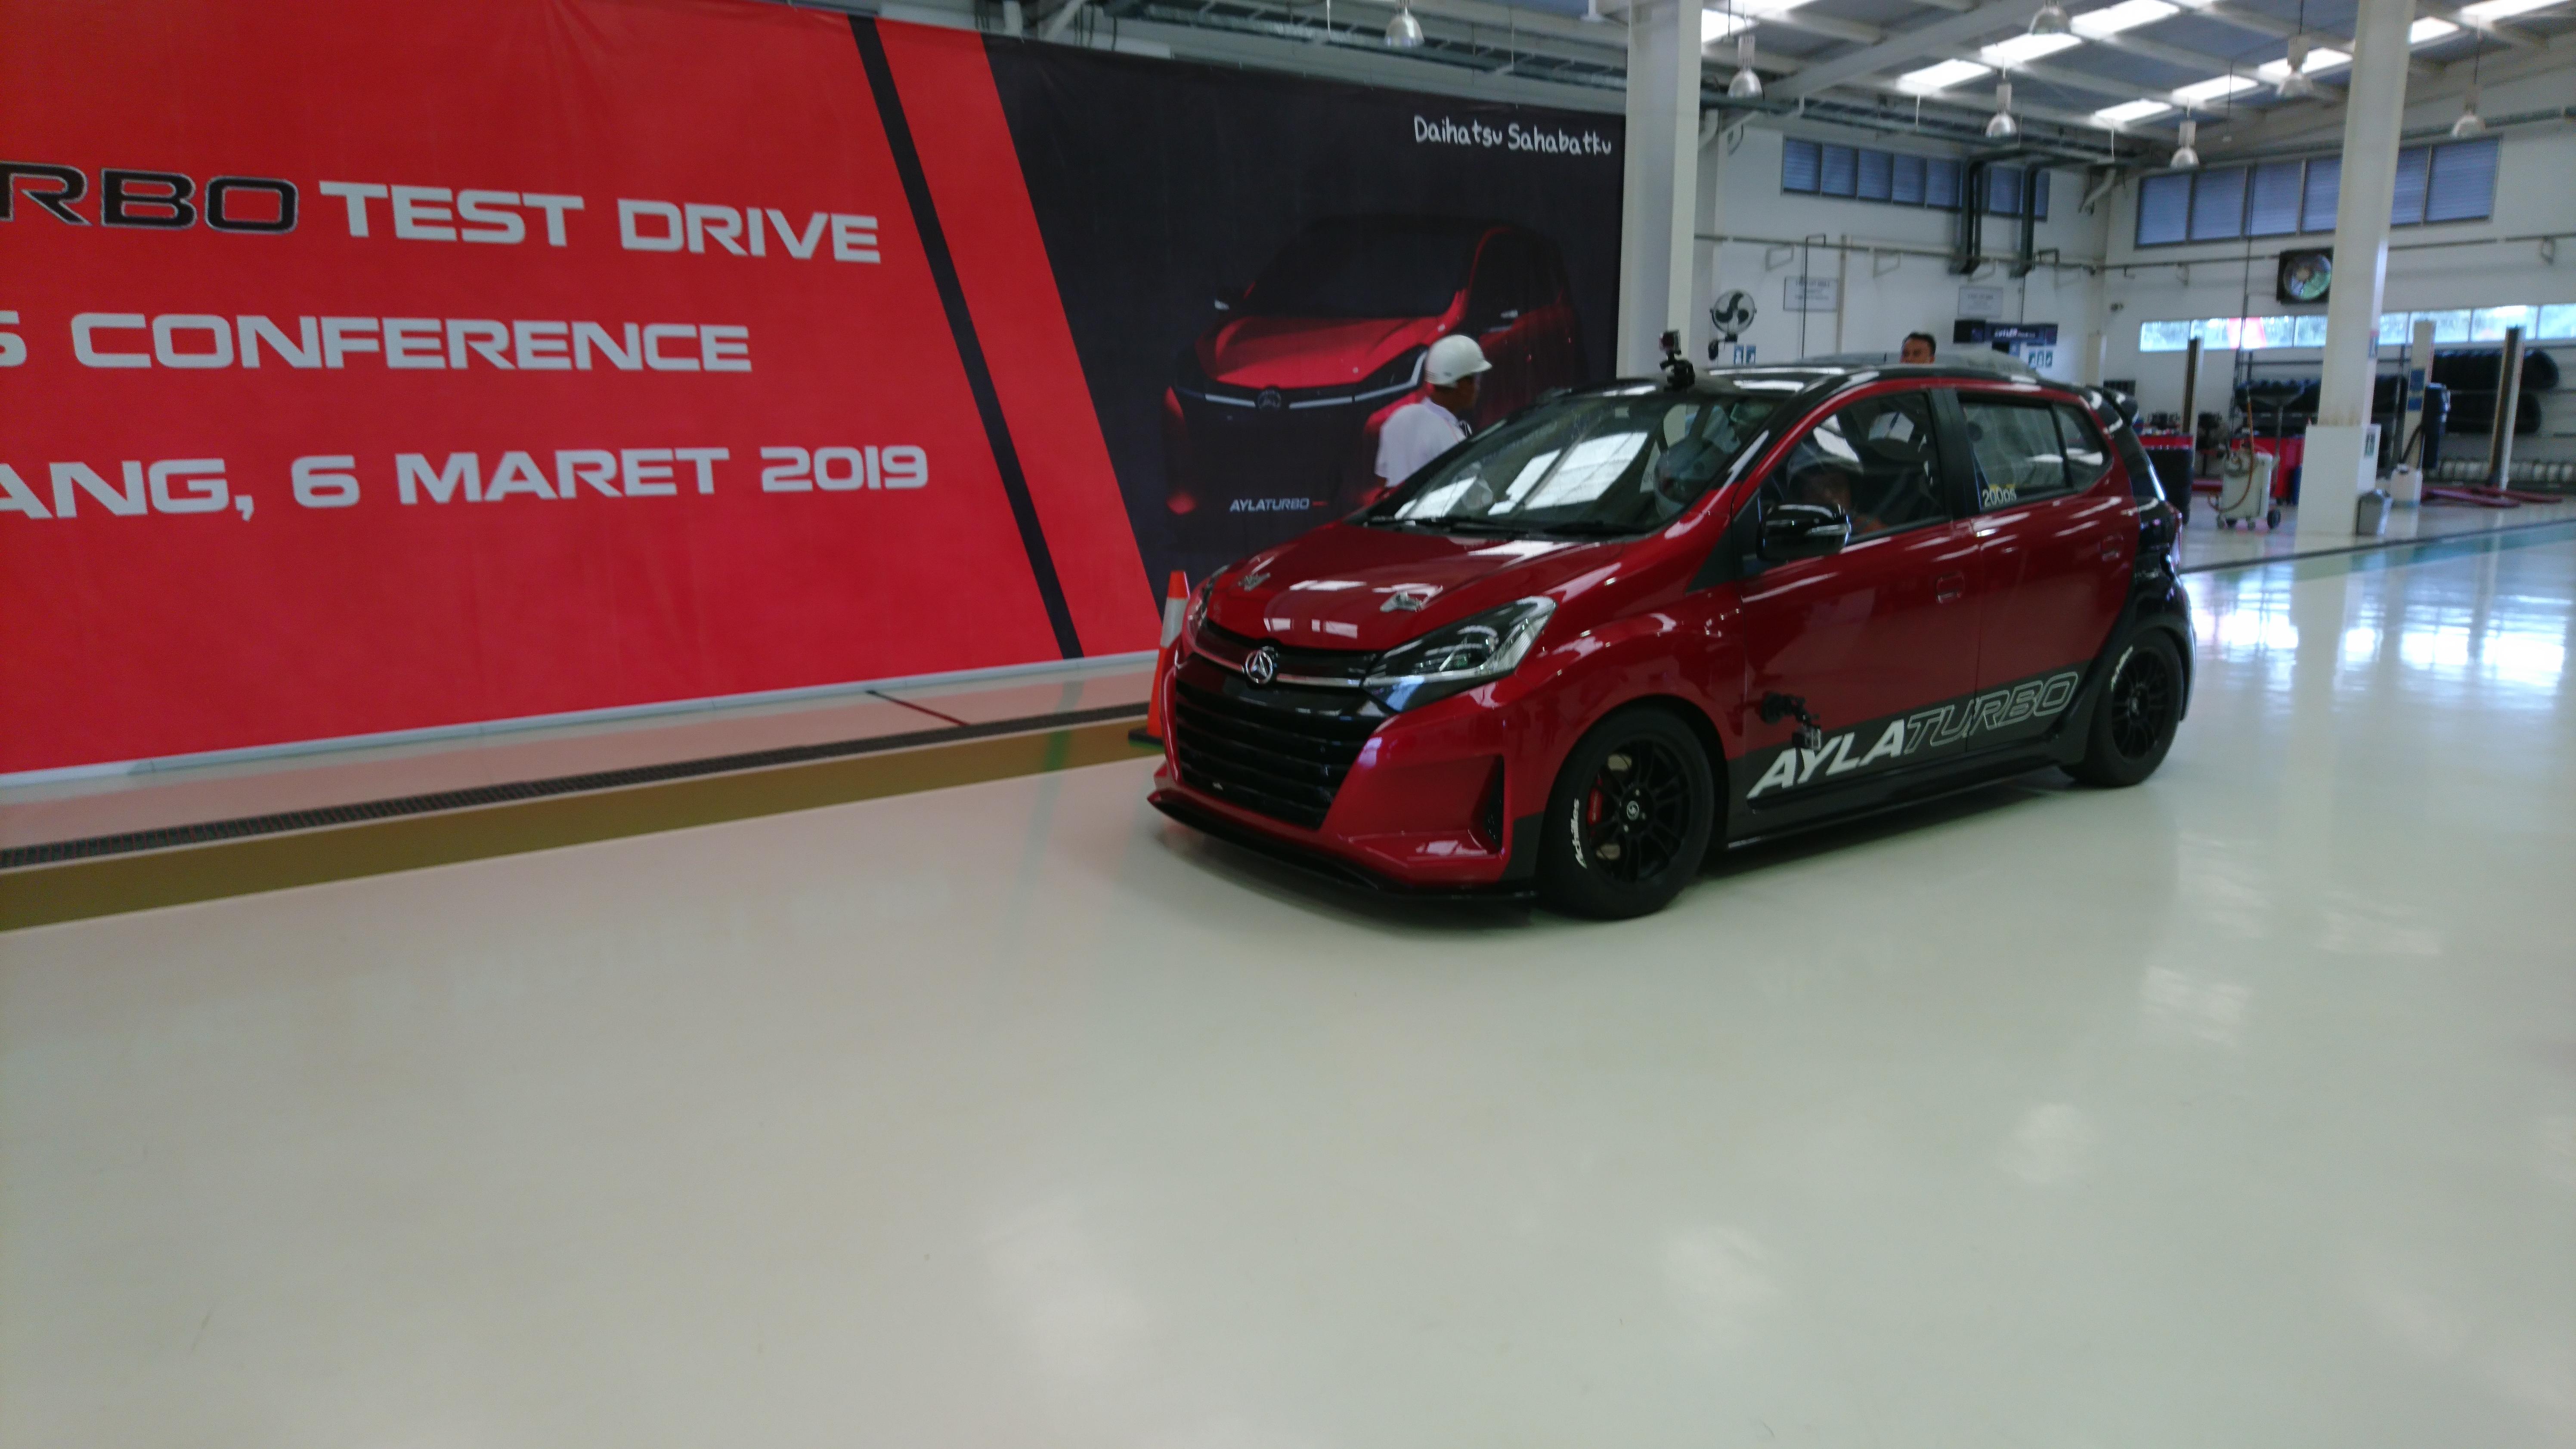 Test Drive Daihatsu Ayla Turbo